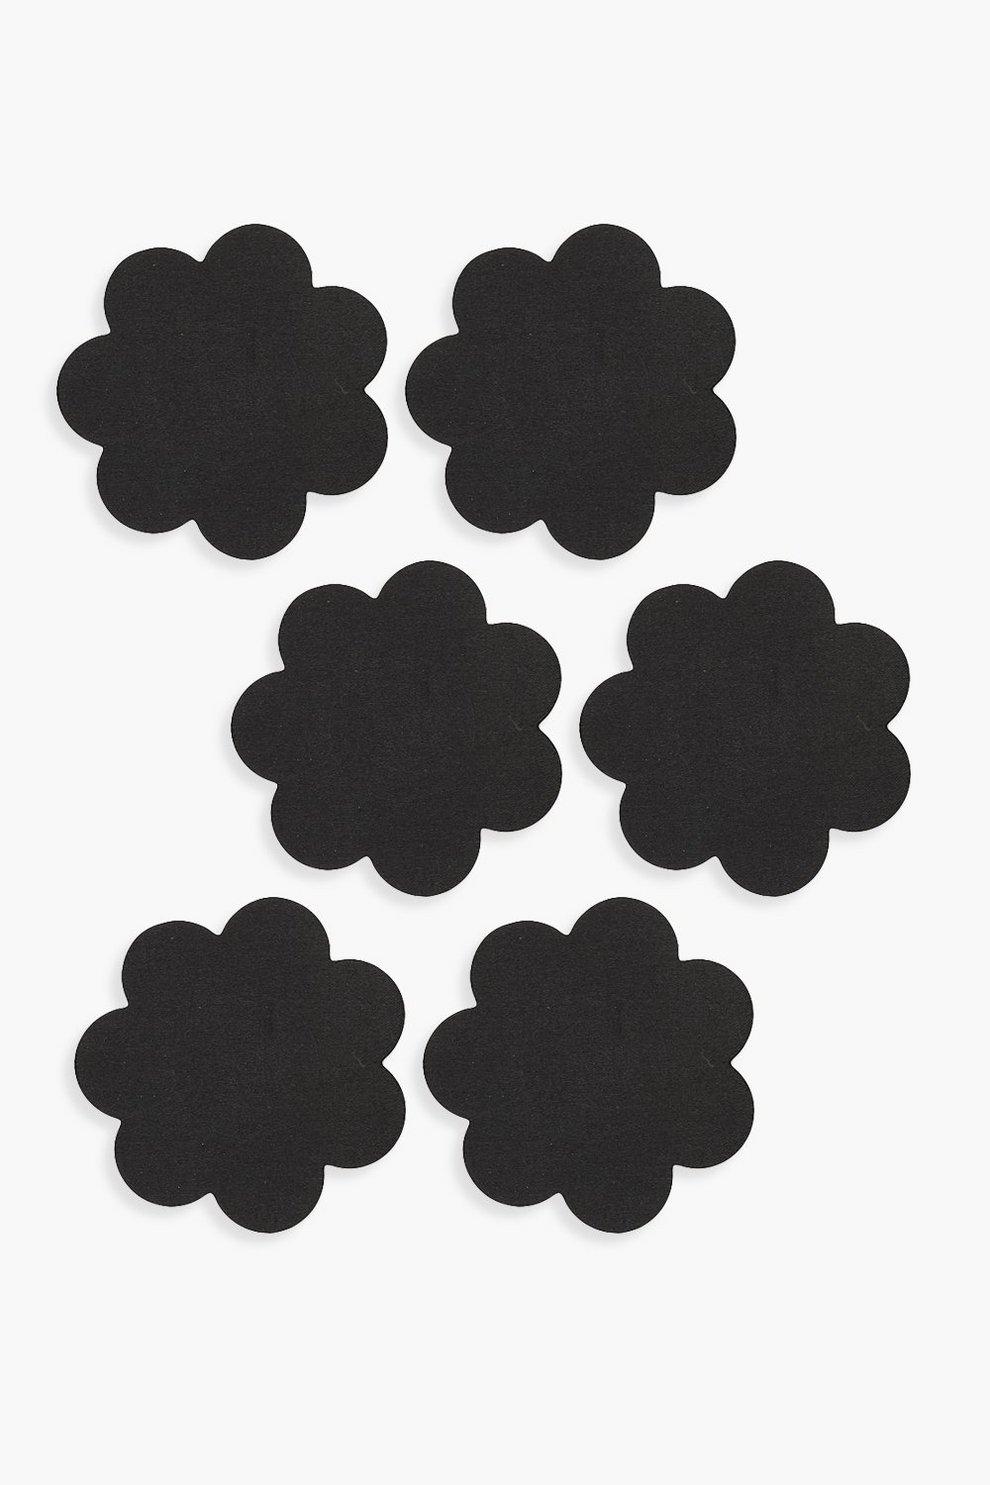 3db9f1e53c1 Black Satin Flower Nipple Covers 3 Pack